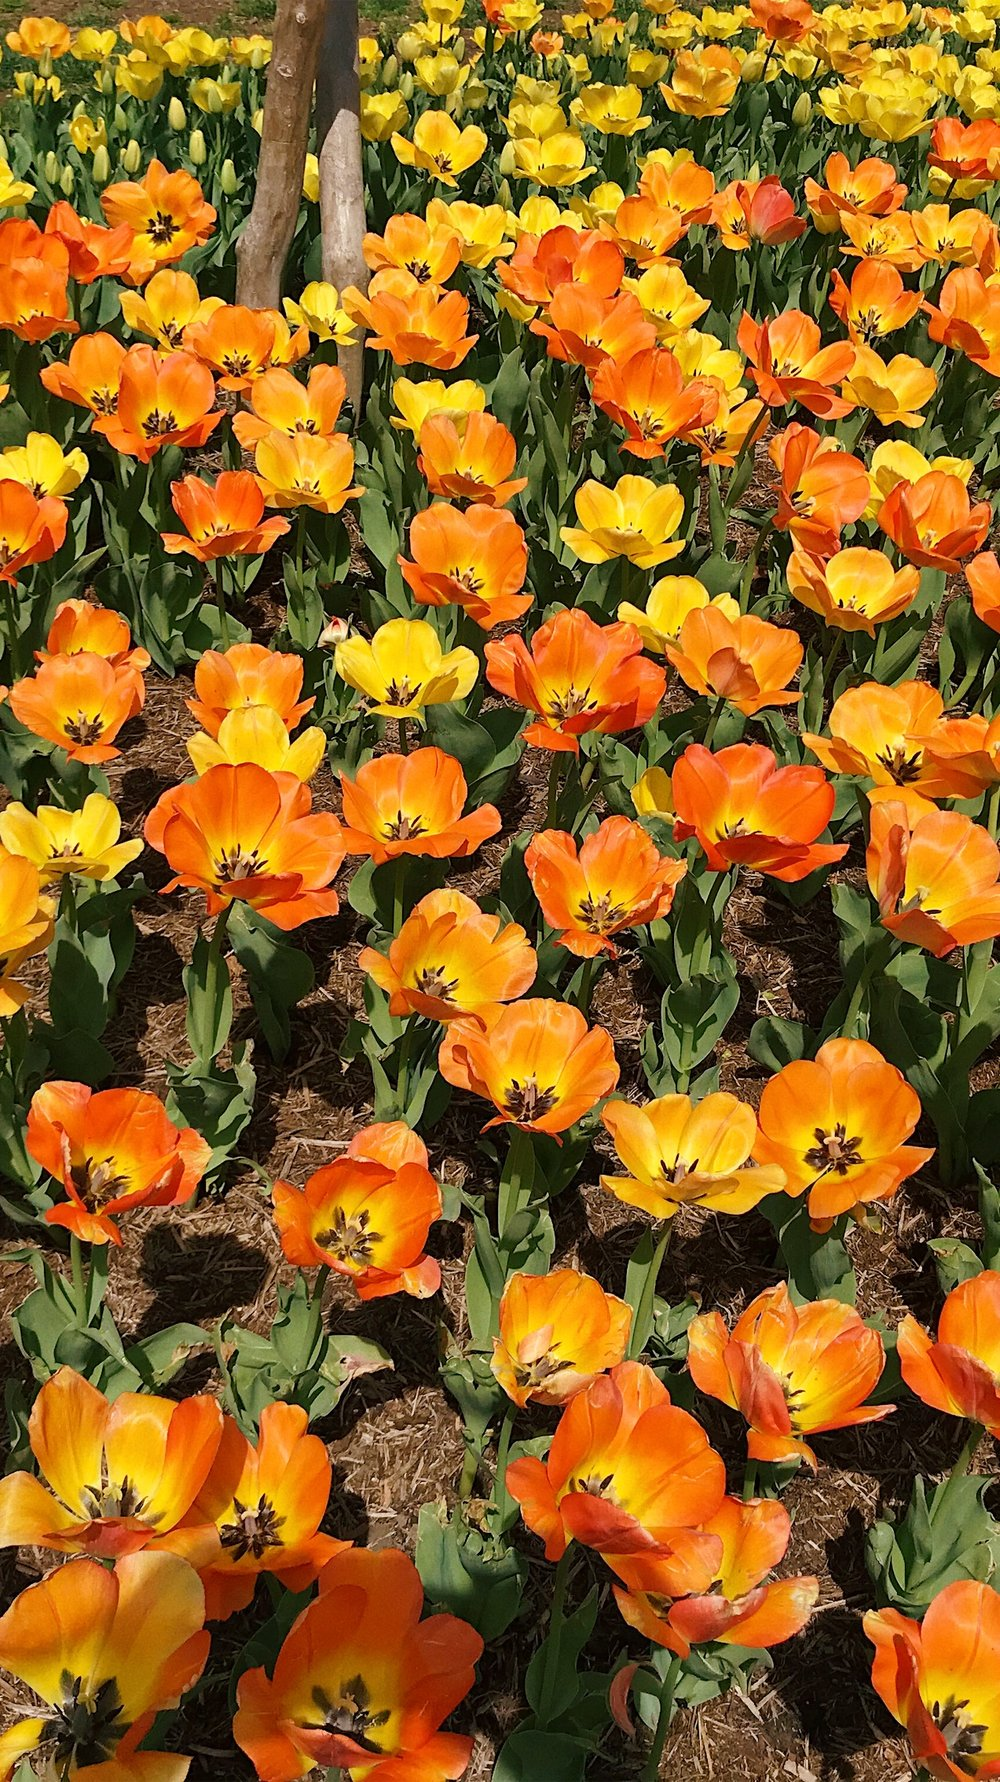 Spring Tulips in Washington DC